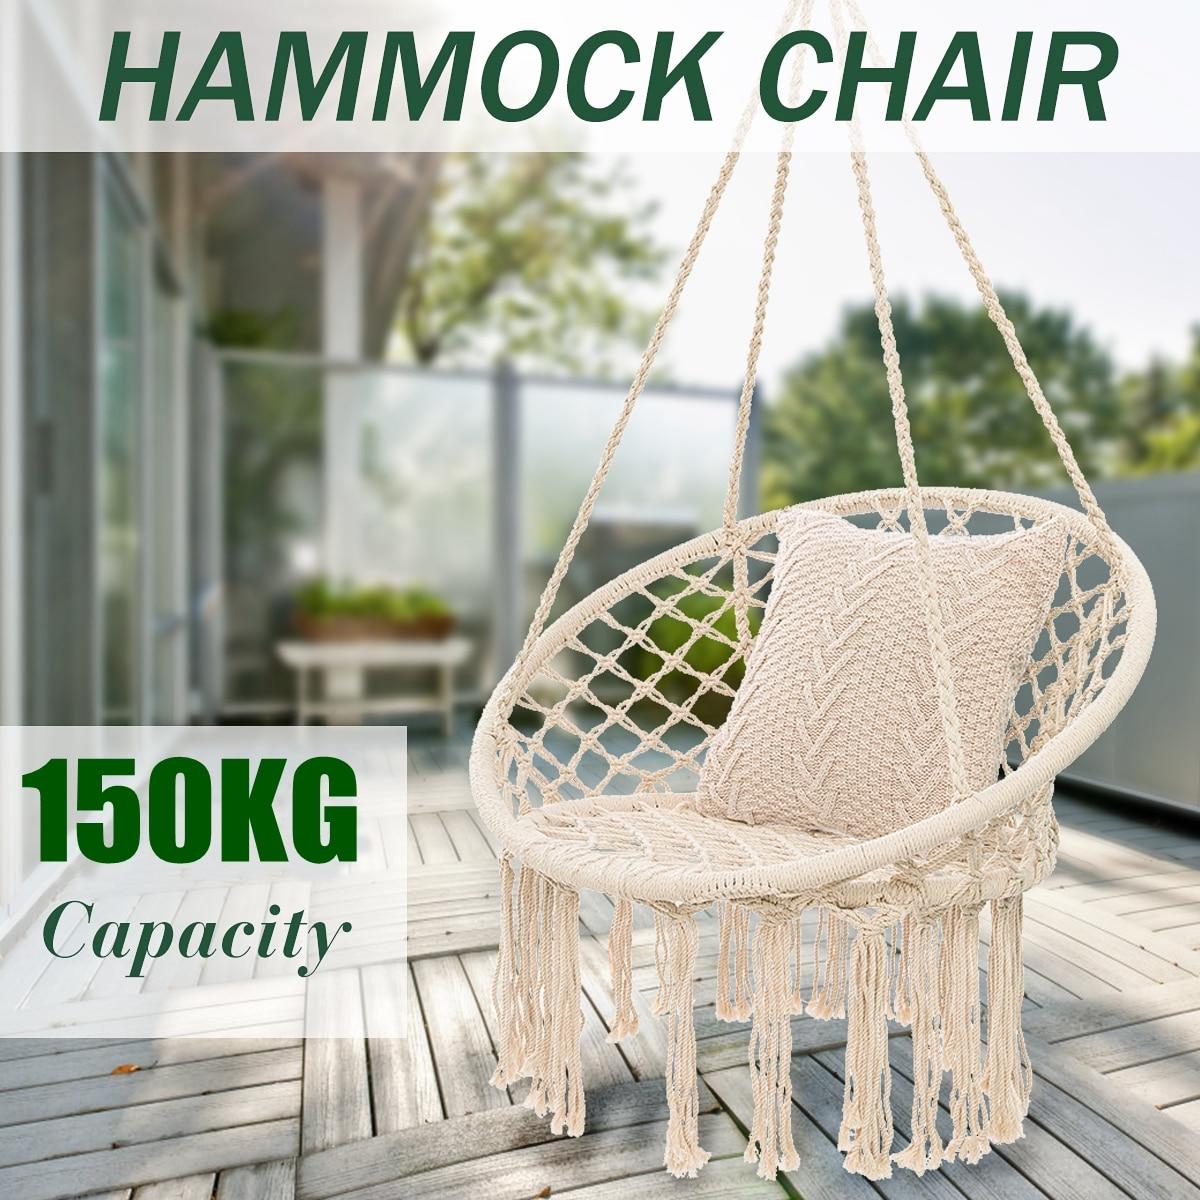 Round Hammock Round Hammock Swing Hanging Chair Outdoor Indoor Furniture Hammock Chair for Garden Dormitory Child Adult 1